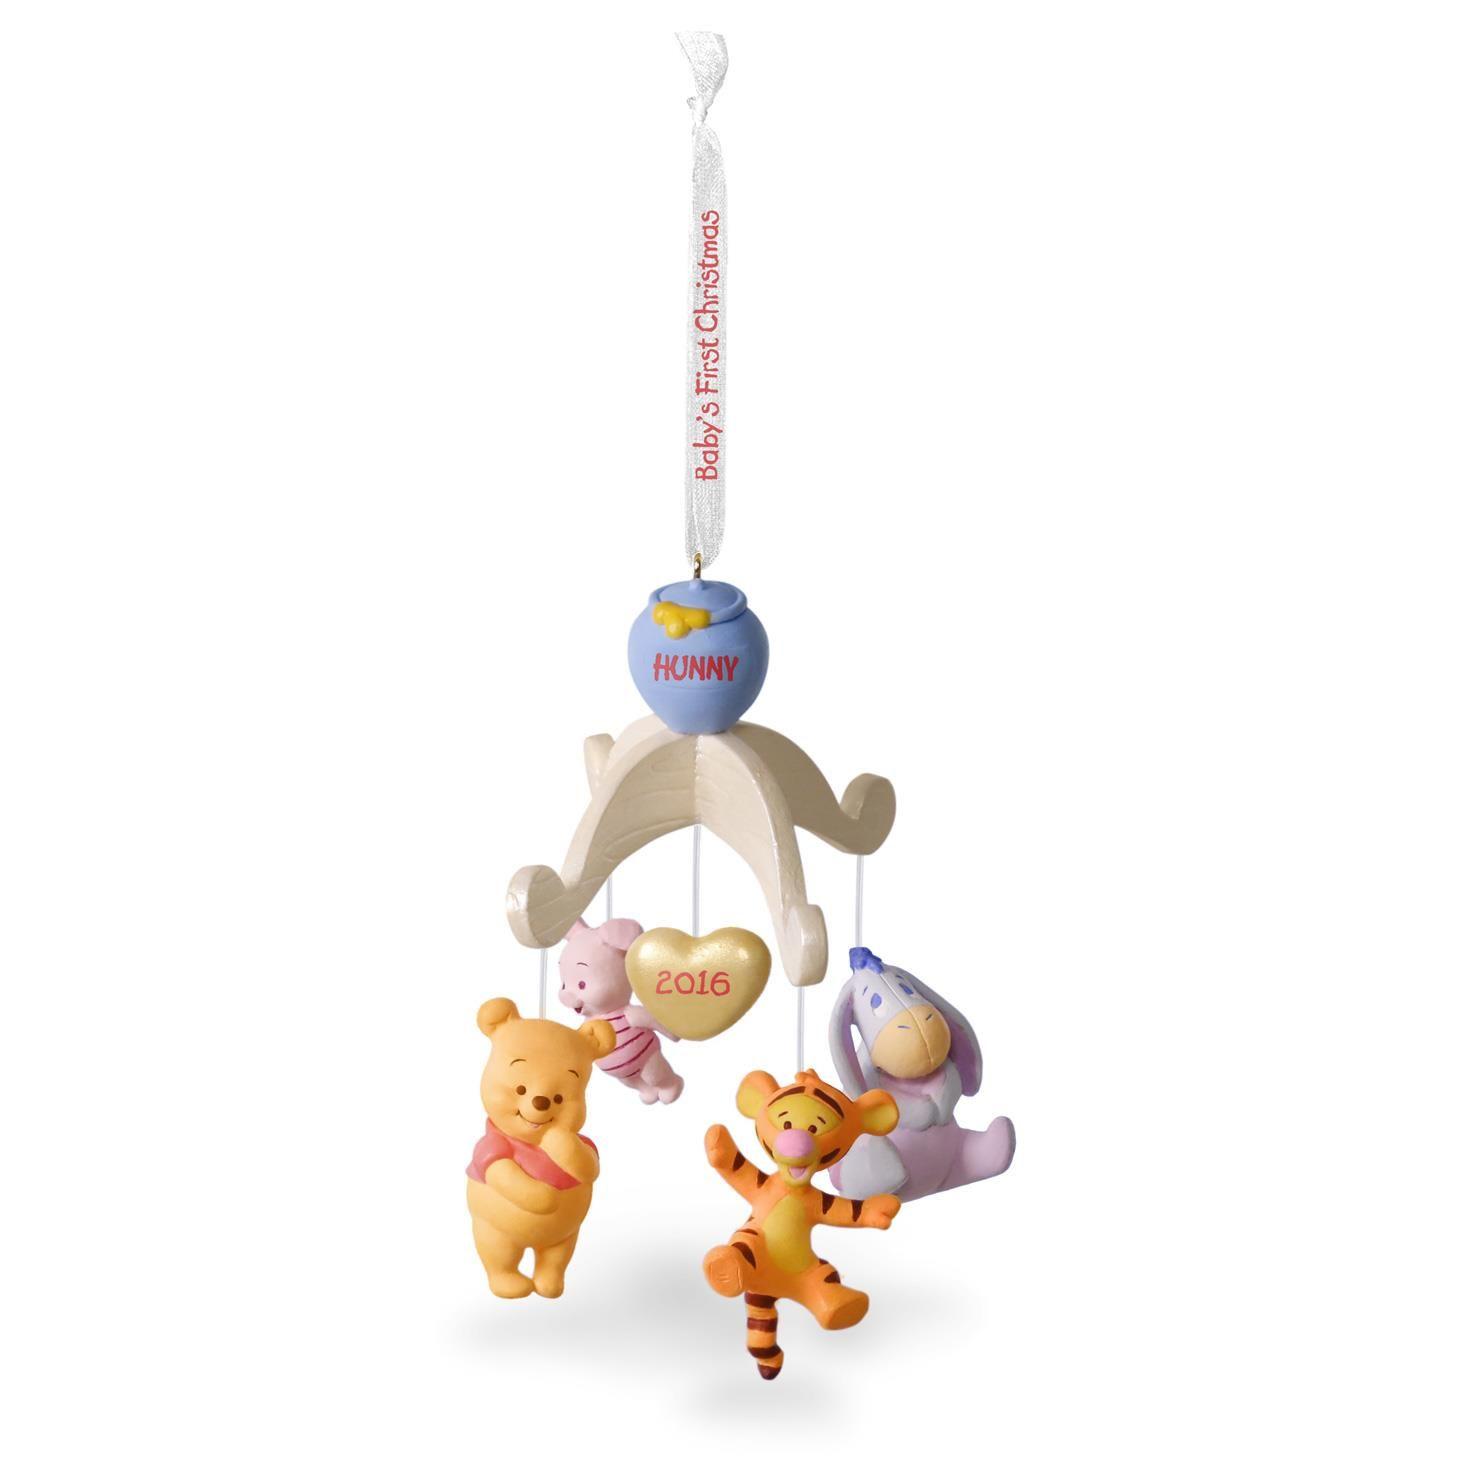 2016 babys first christmas hallmark keepsake ornament hooked on hallmark ornaments